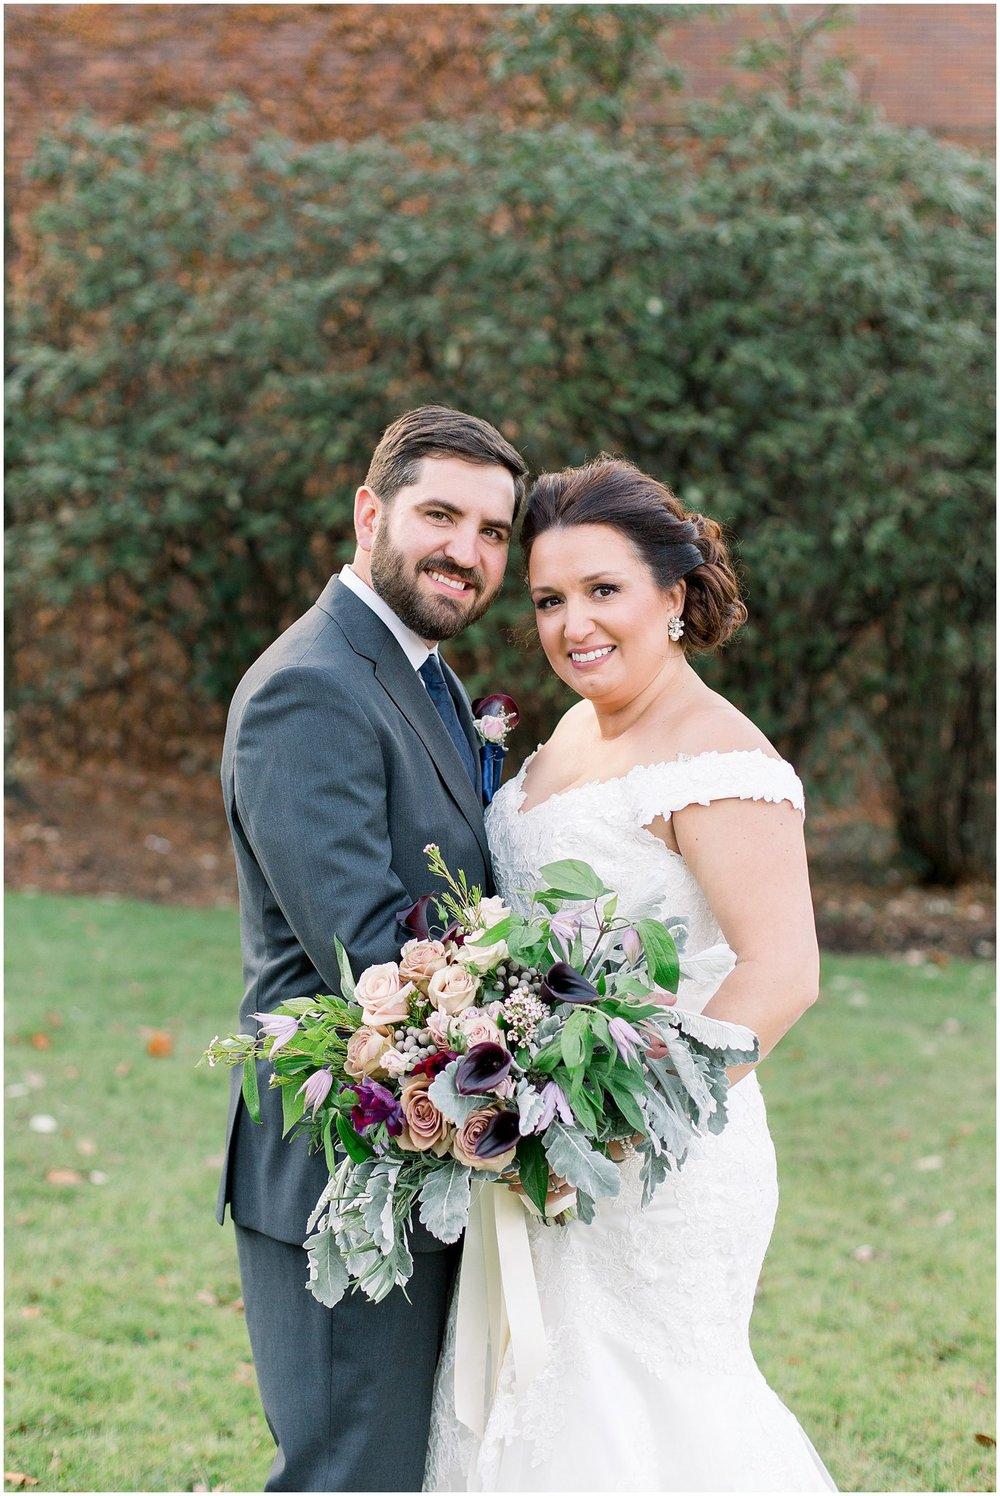 Hyatt-Lodge-Mcdonald-Campus-Wedding_0027.jpg